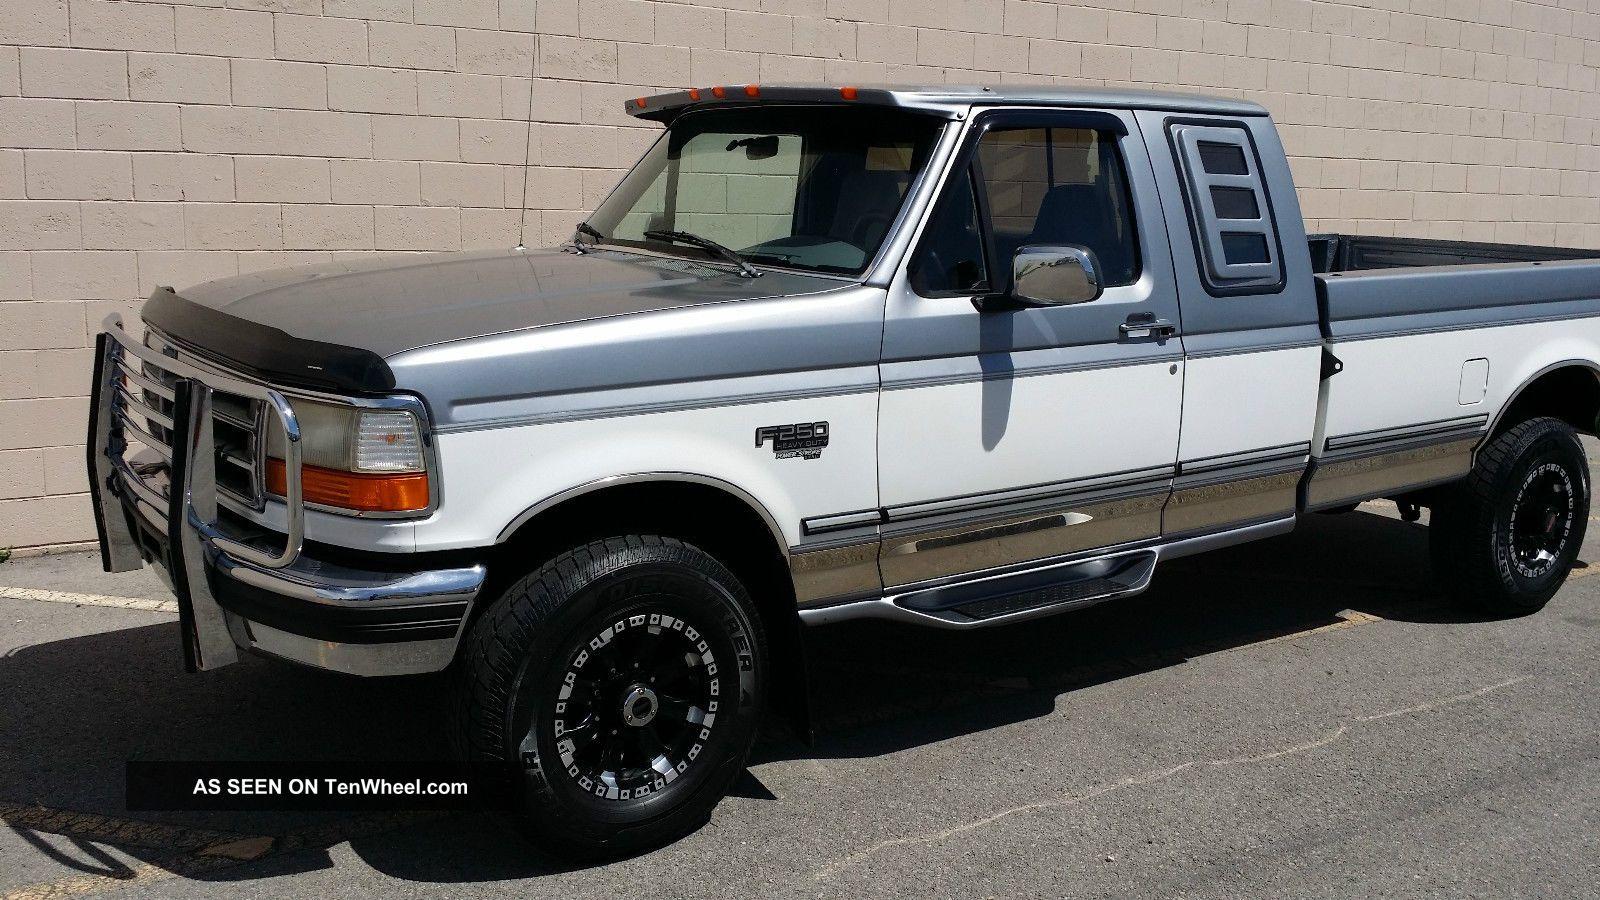 1976 chevrolet k10 pickup interior 157719 - 1997 F250 Supercab Xlt 4x4 Longbed 7 3 Powerstroke Turbo Diesel 177k 67 72 Chevrolet 4 Sale Autos Post 1976 Chevrolet K10 Pickup